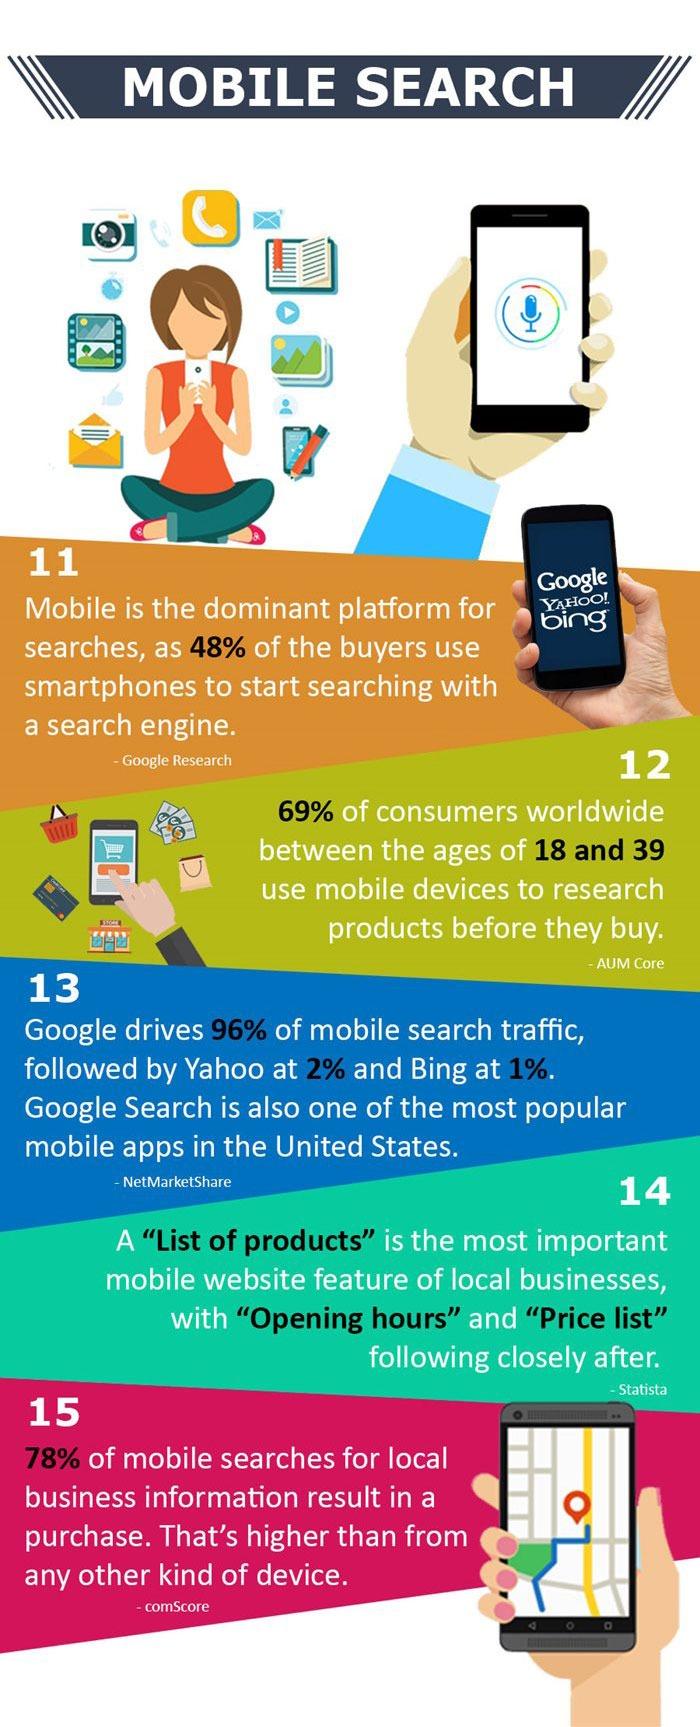 2018-mobile-statistics-3 - SocialMedia.org.nz